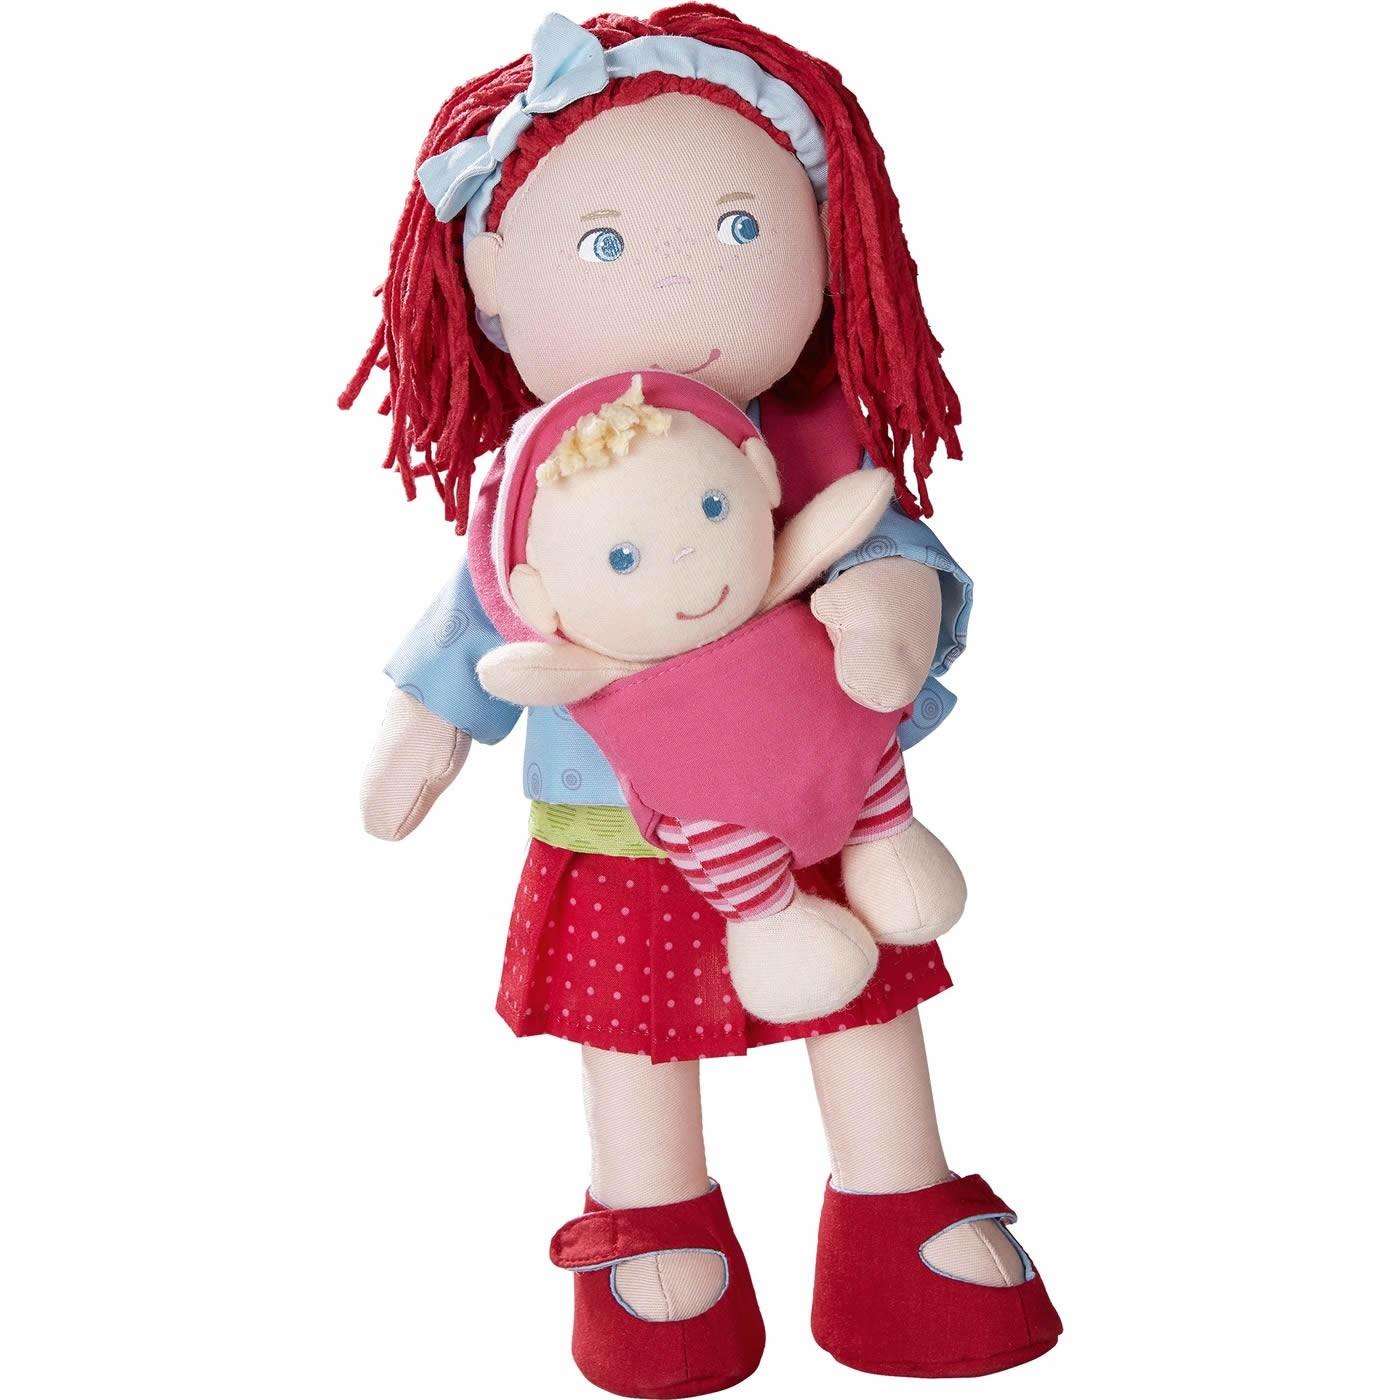 Haba Rubina Babywearing Doll